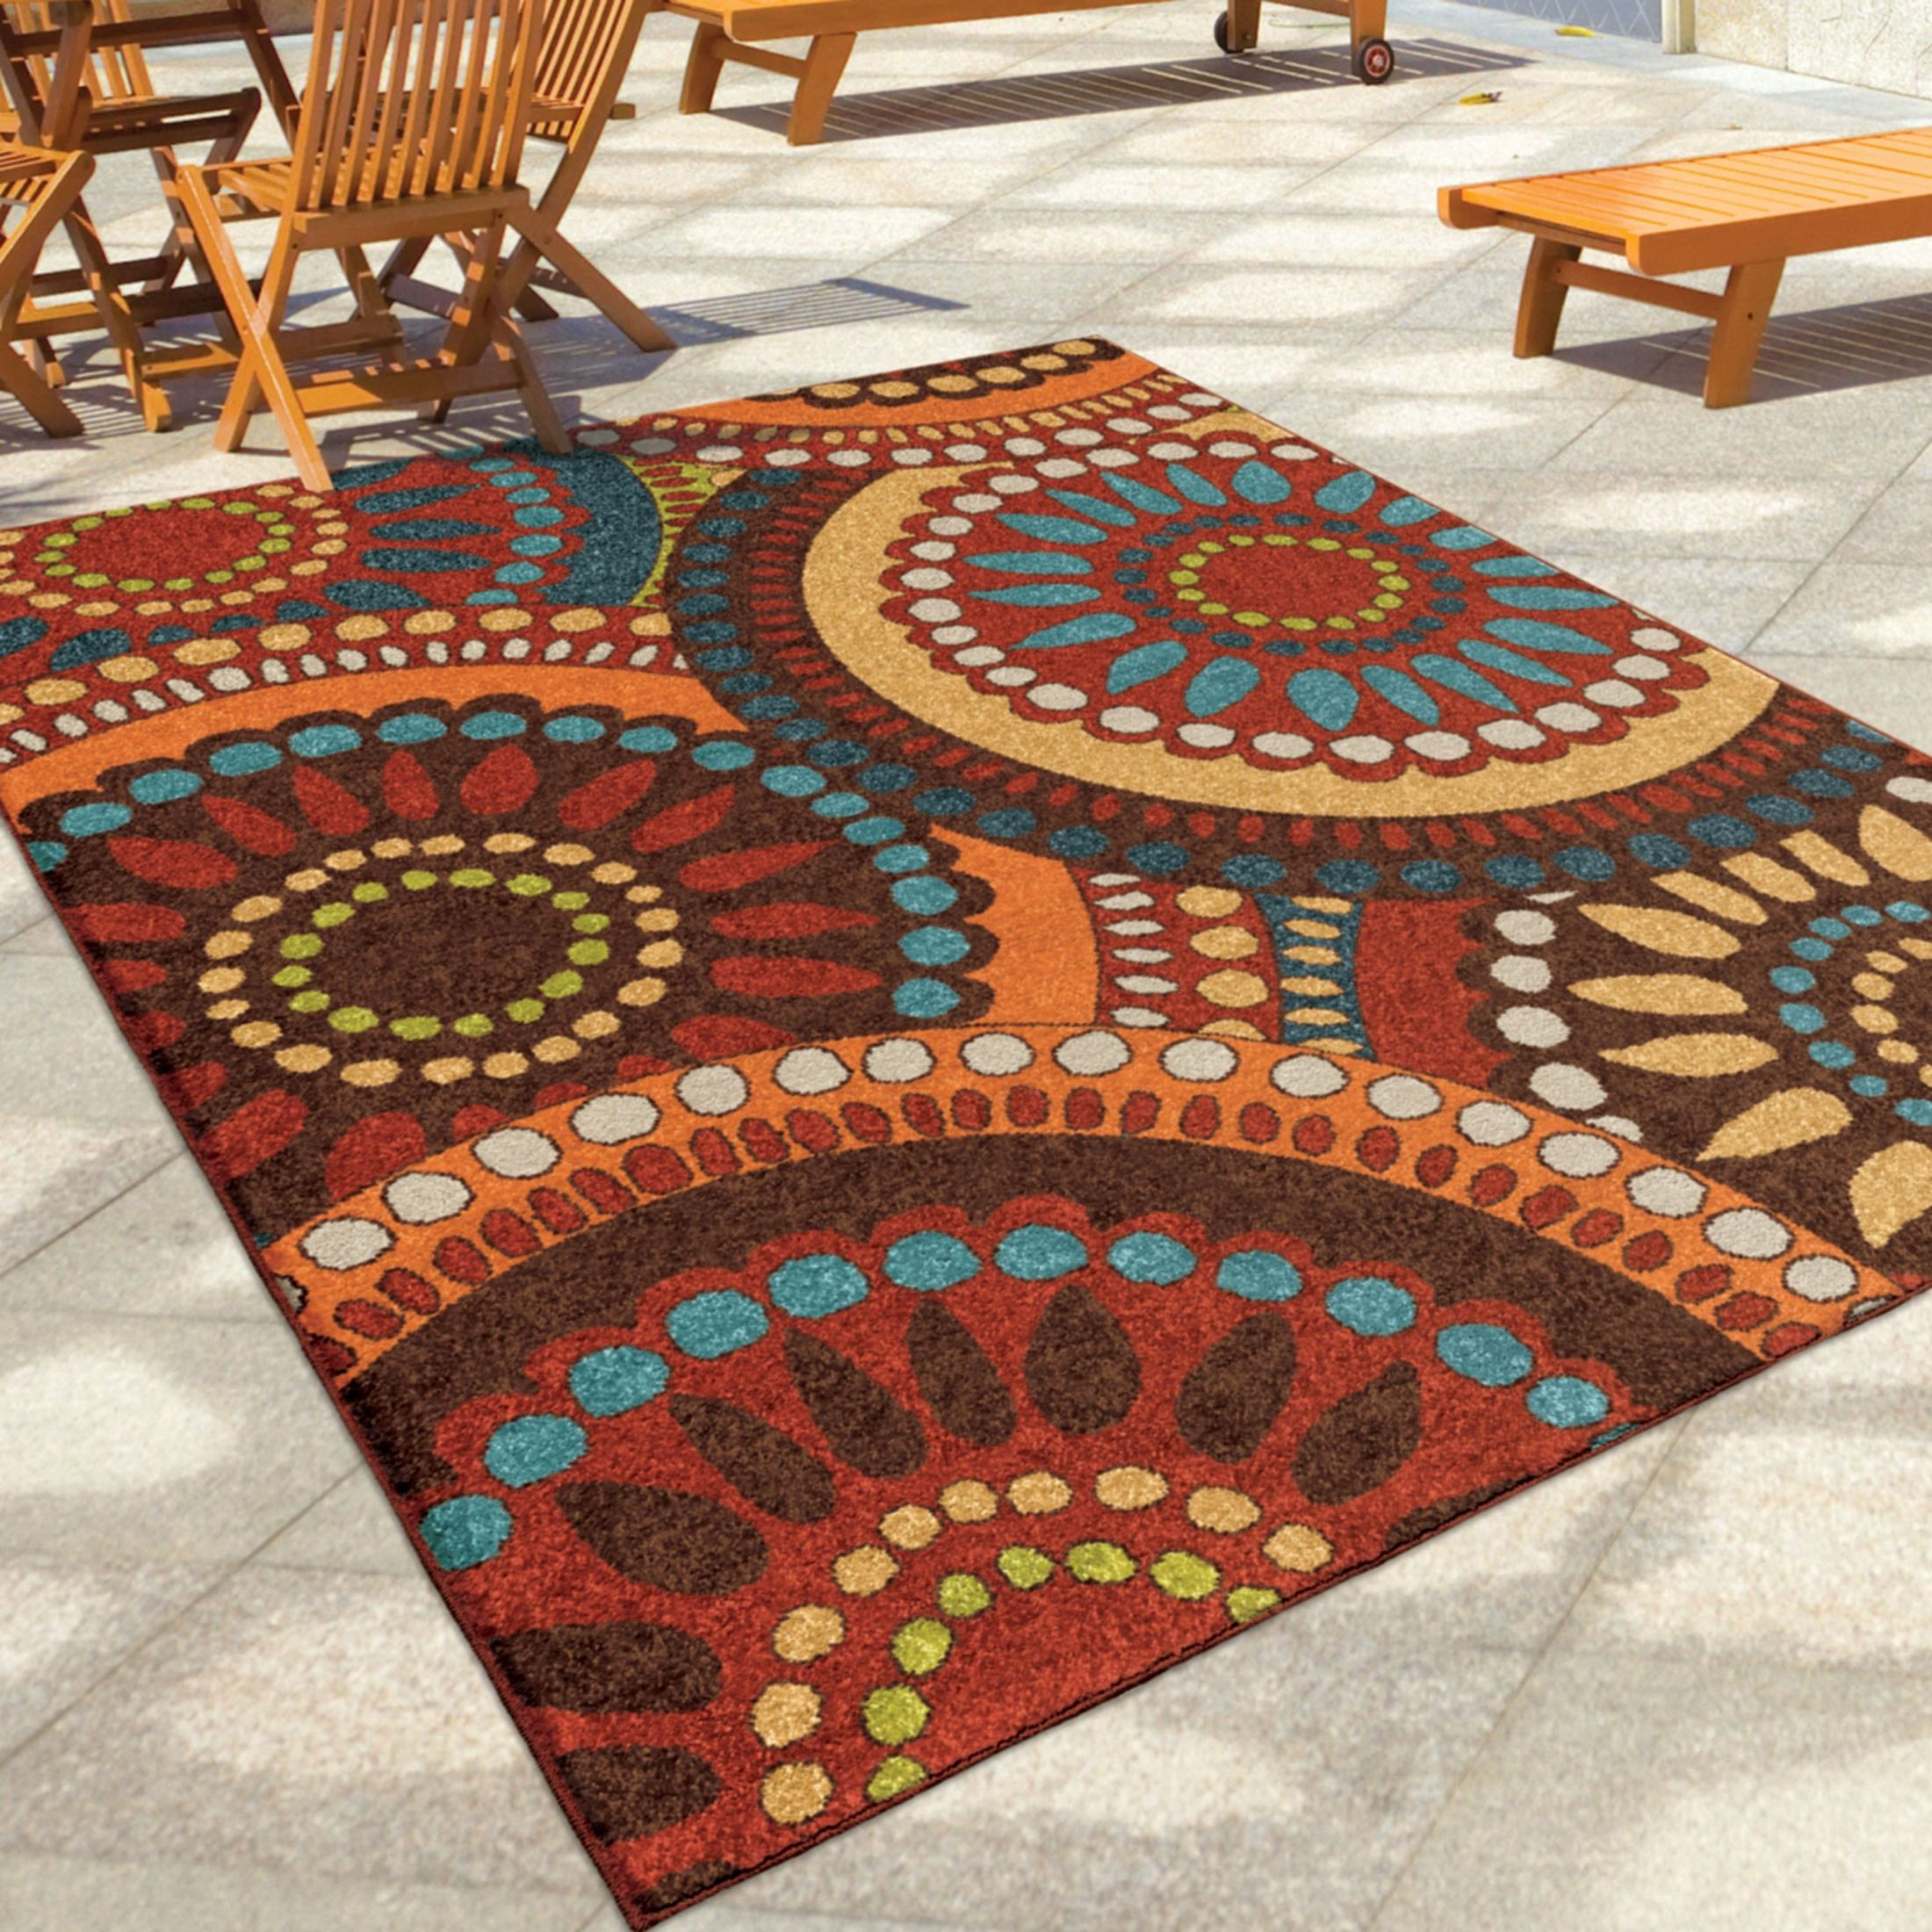 7x10 Rug: Orian Rugs Indoor/Outdoor Circles Merrifield Collage Multi